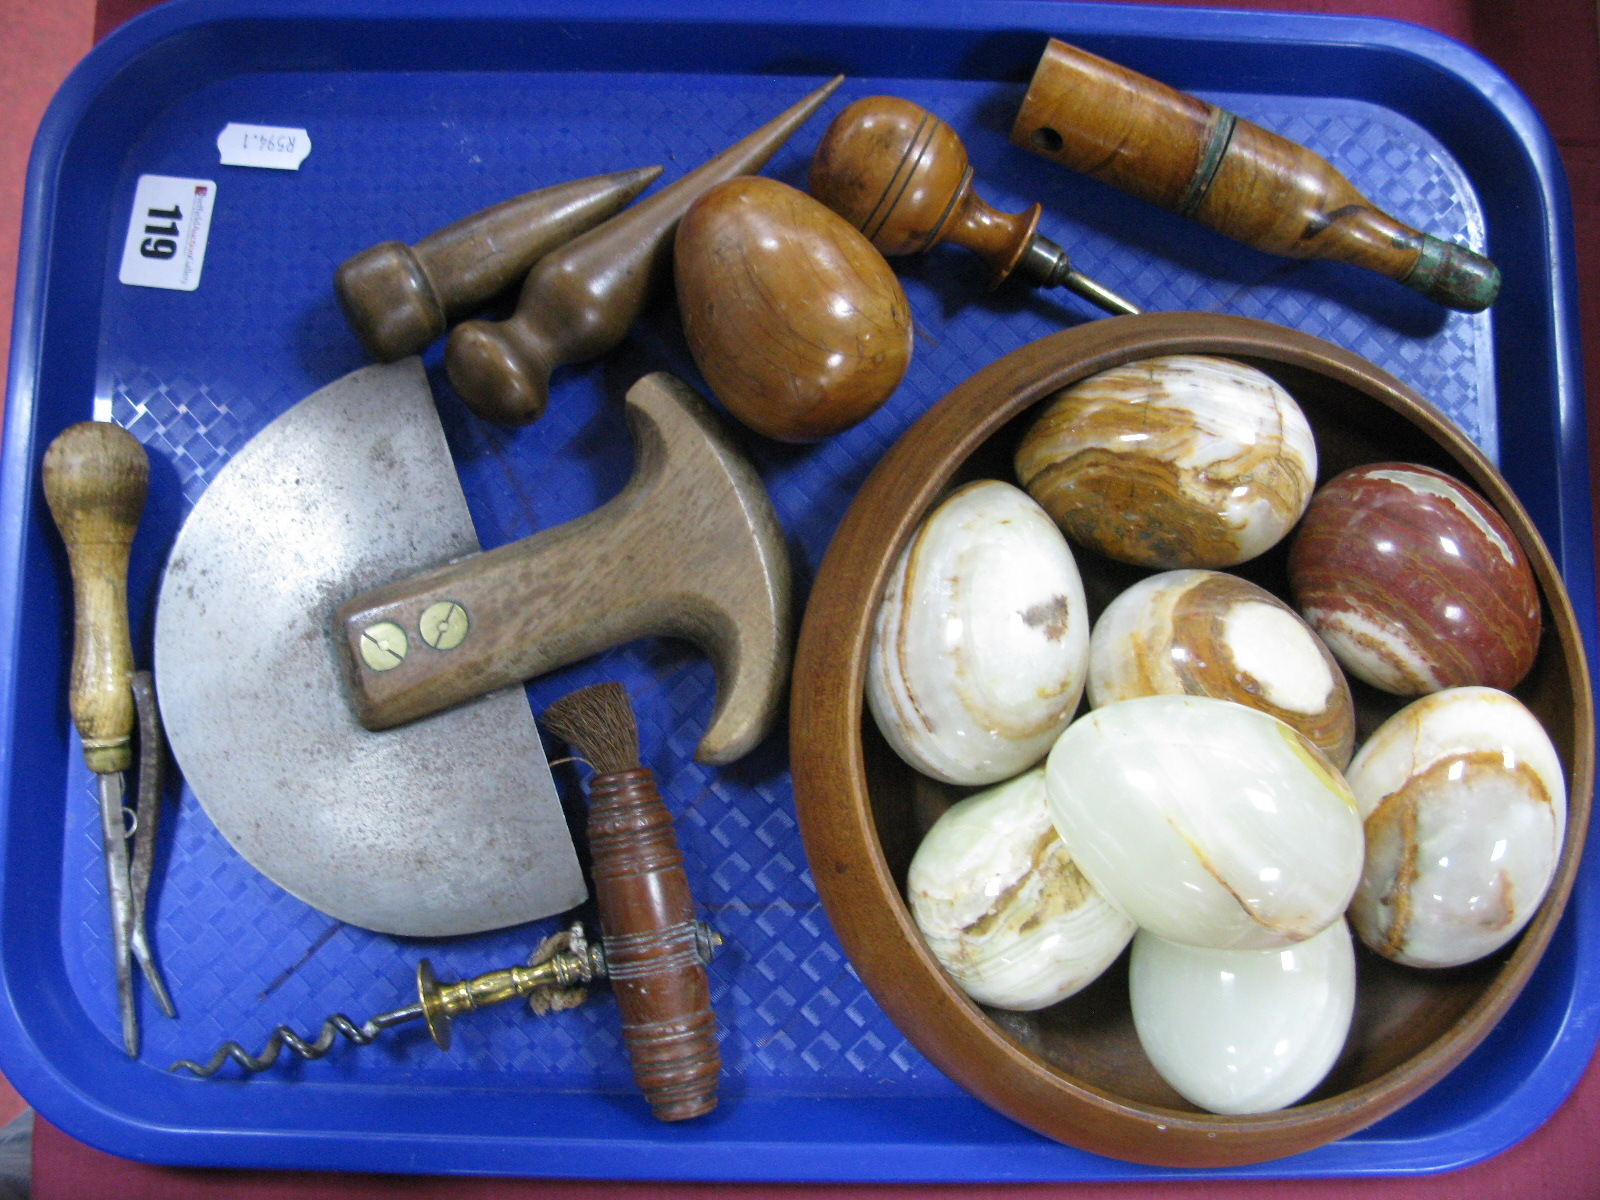 Lot 119 - A XIX Century Corkscrew, XIX Century Spice Chopper, Onyx hand coolers, walnut bowl etc:- One Tray